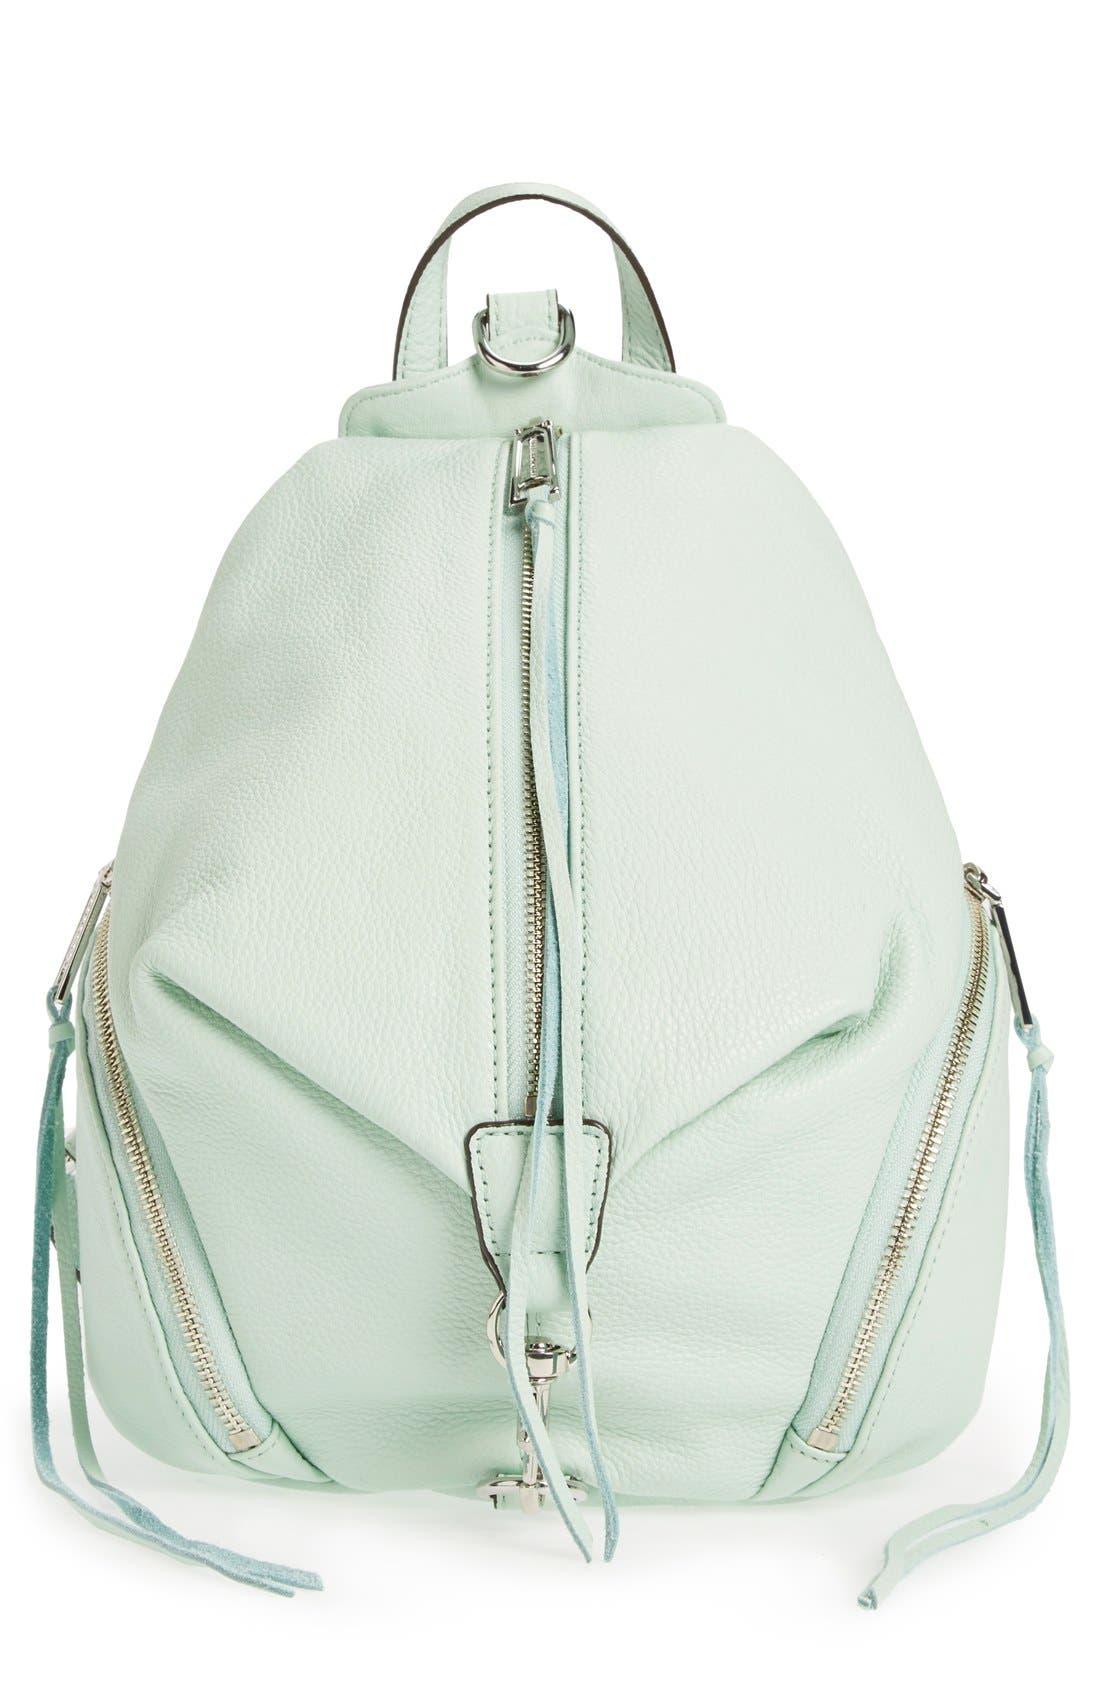 Main Image - Rebecca Minkoff 'Medium Julian' Backpack